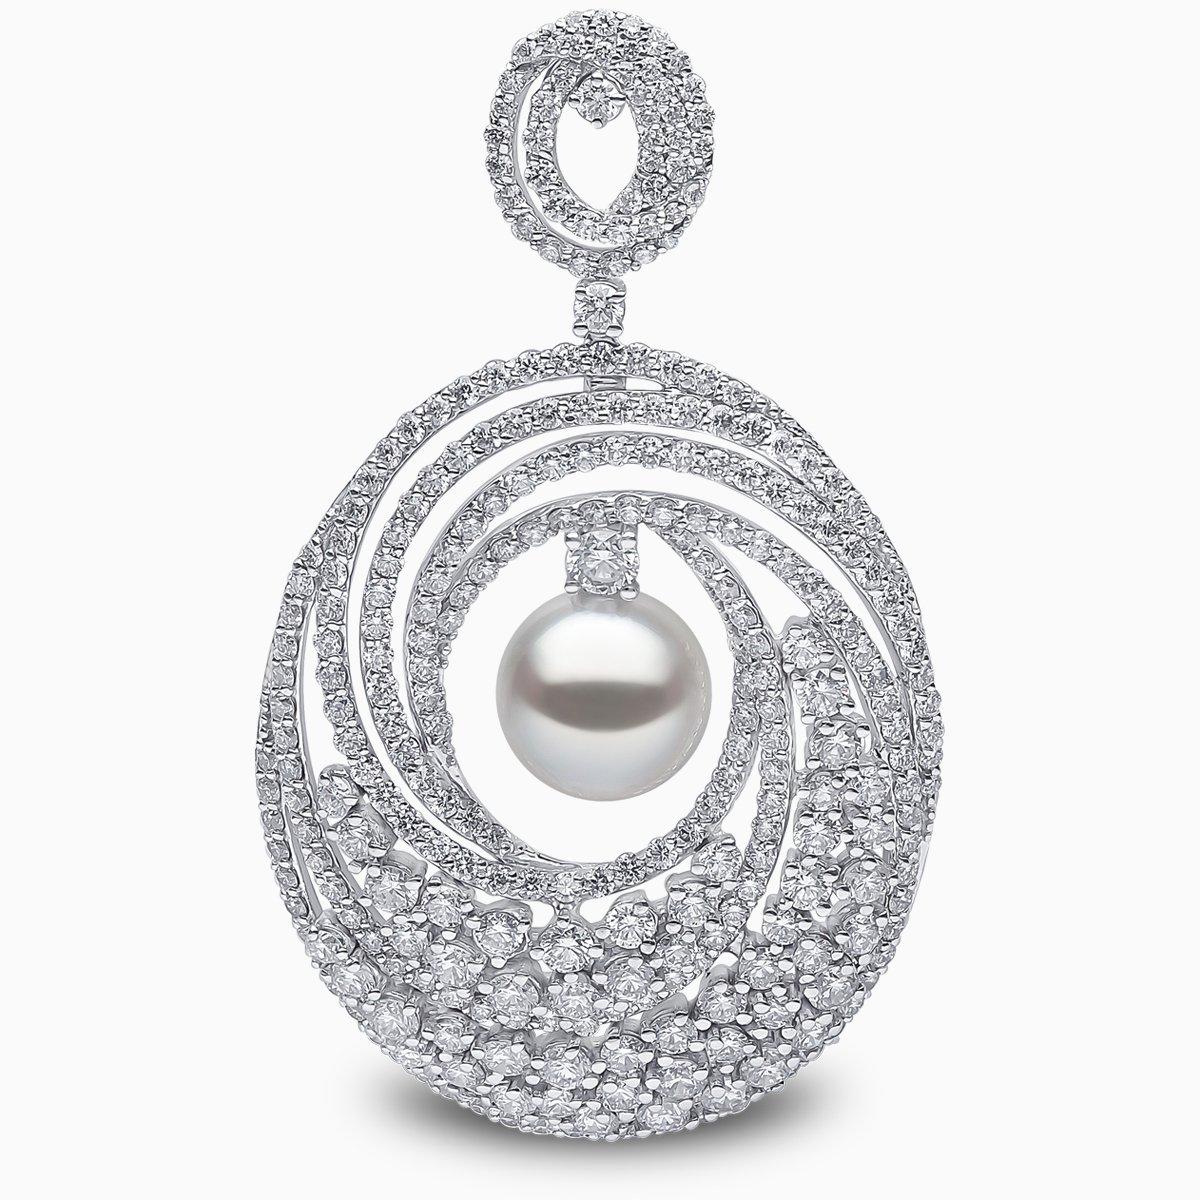 Yoko London Mayfair South Sea Pearl and Diamond Earrings